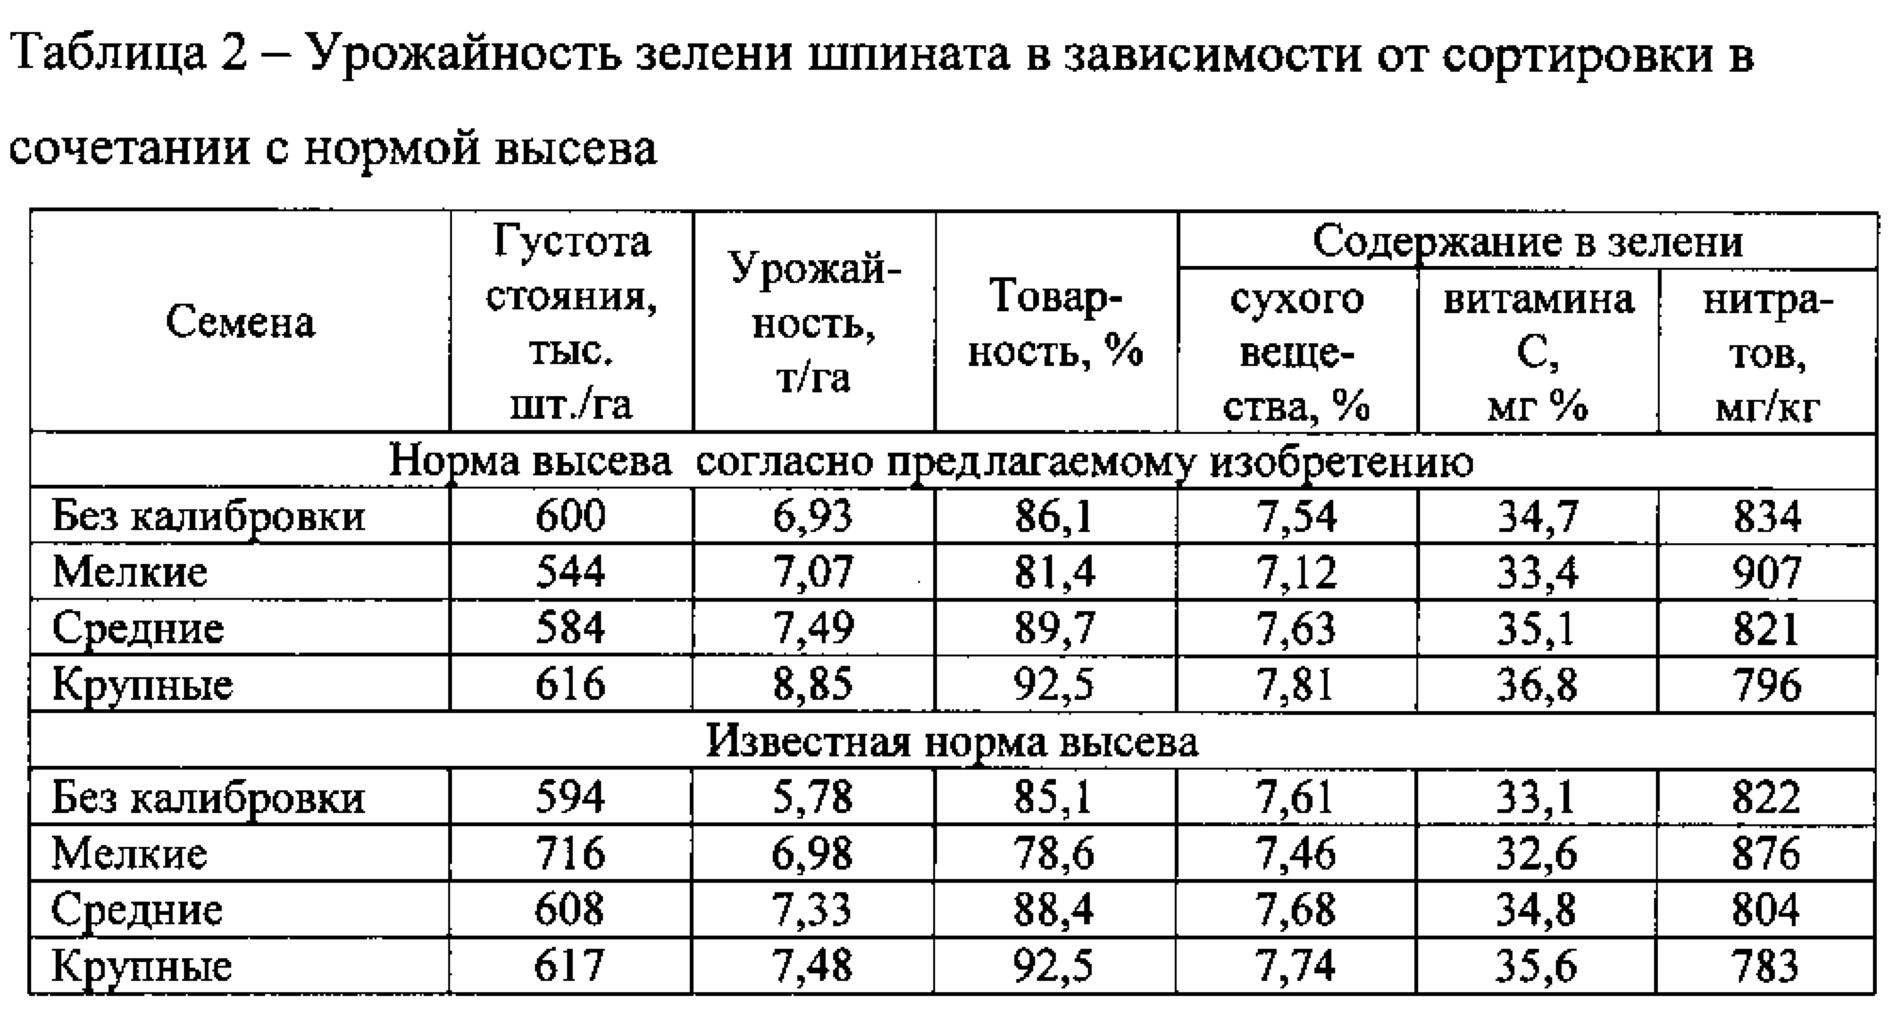 норма высева зерновых на 1 га